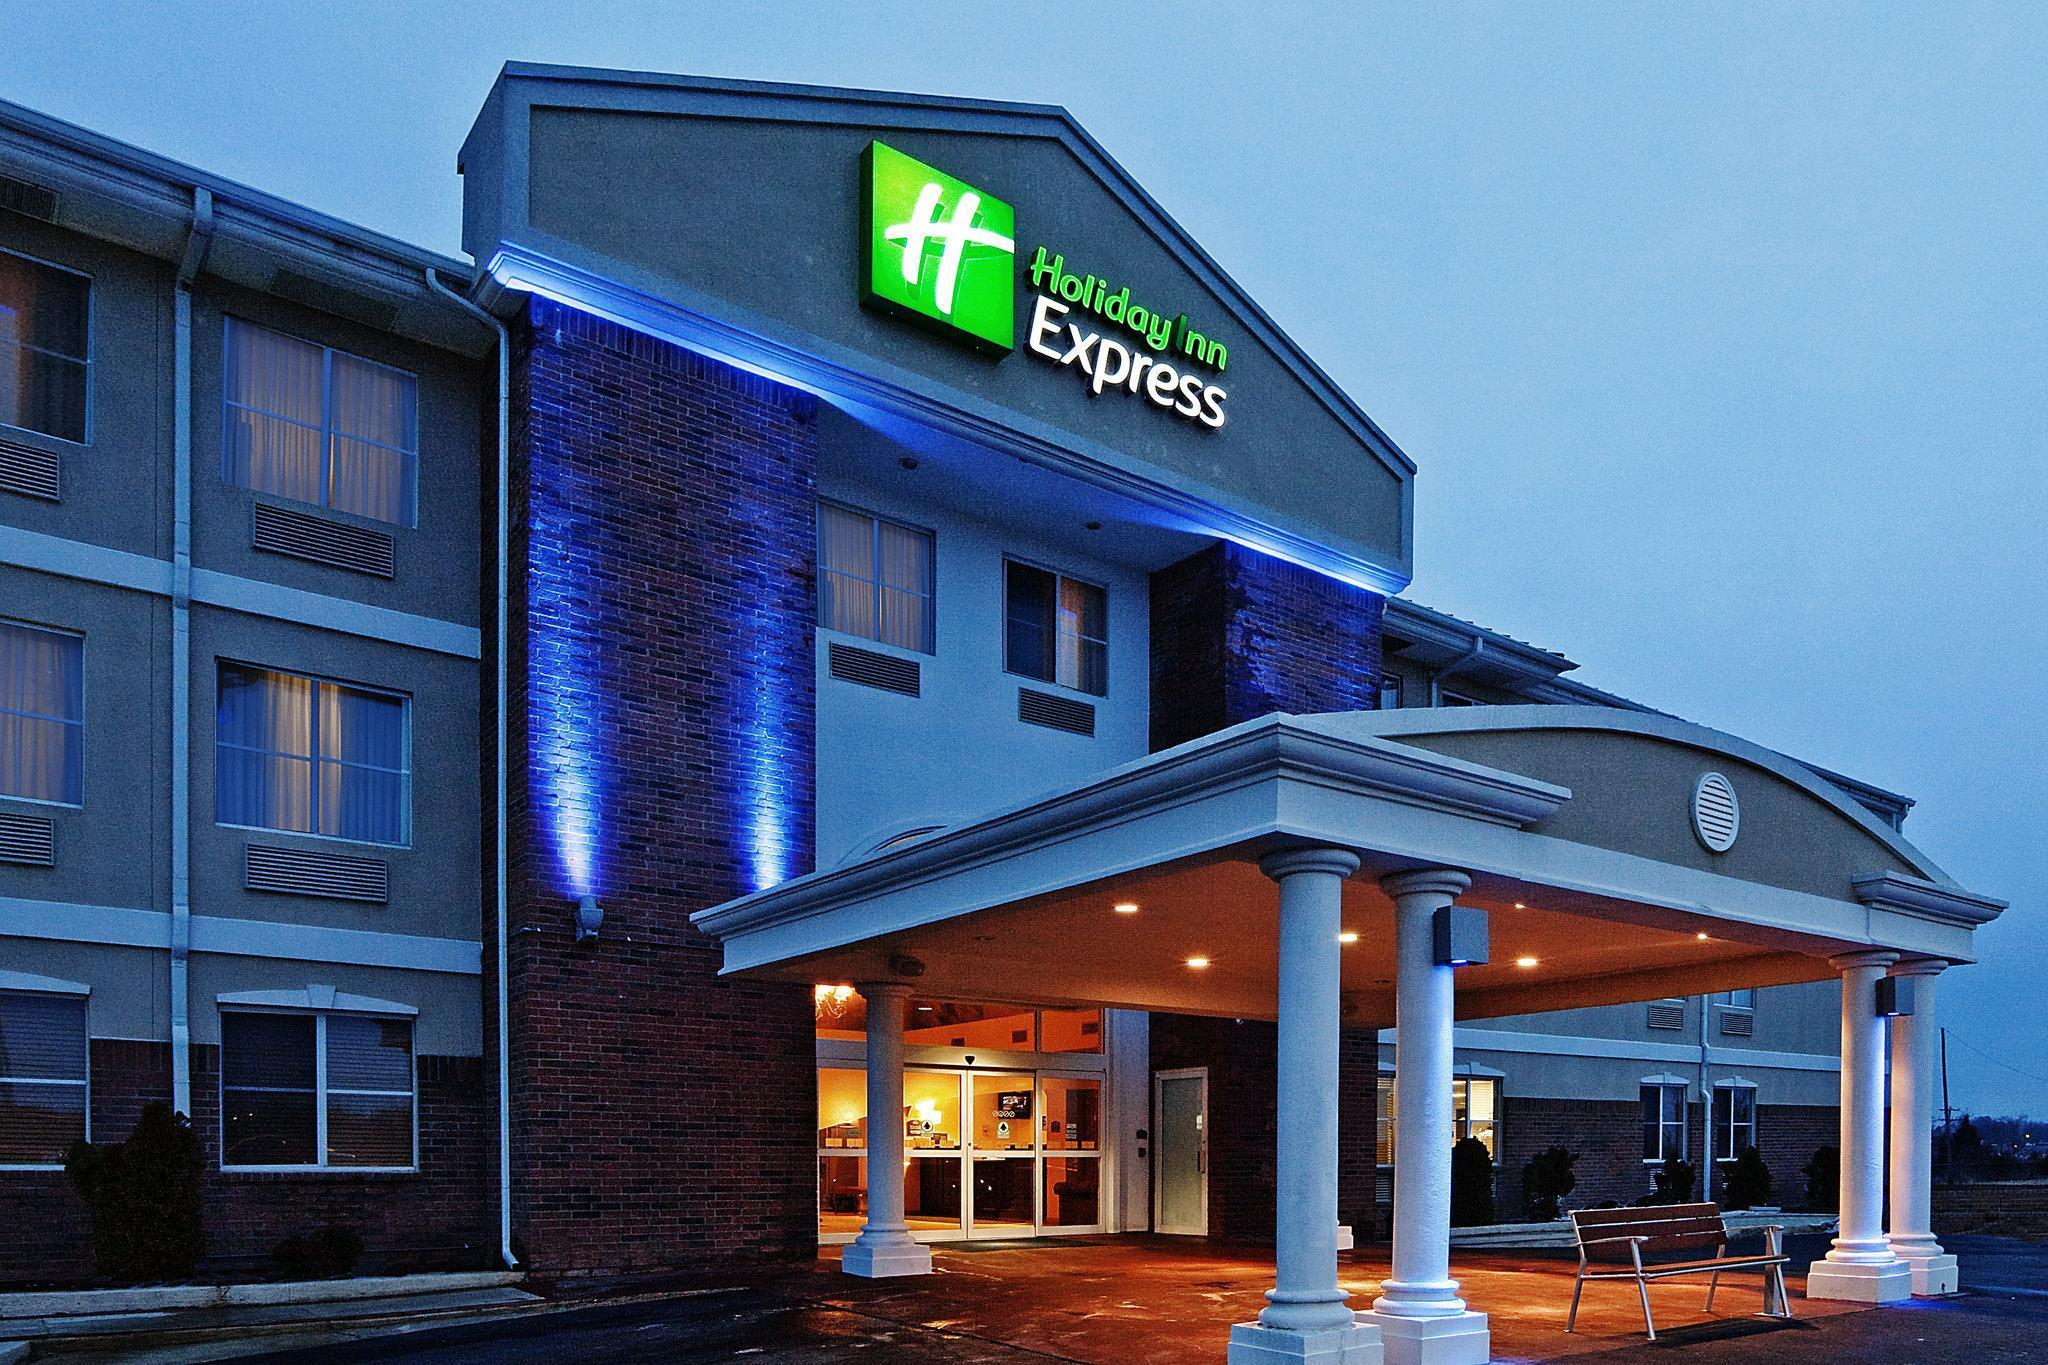 Holiday Inn Express Owasso, Tulsa